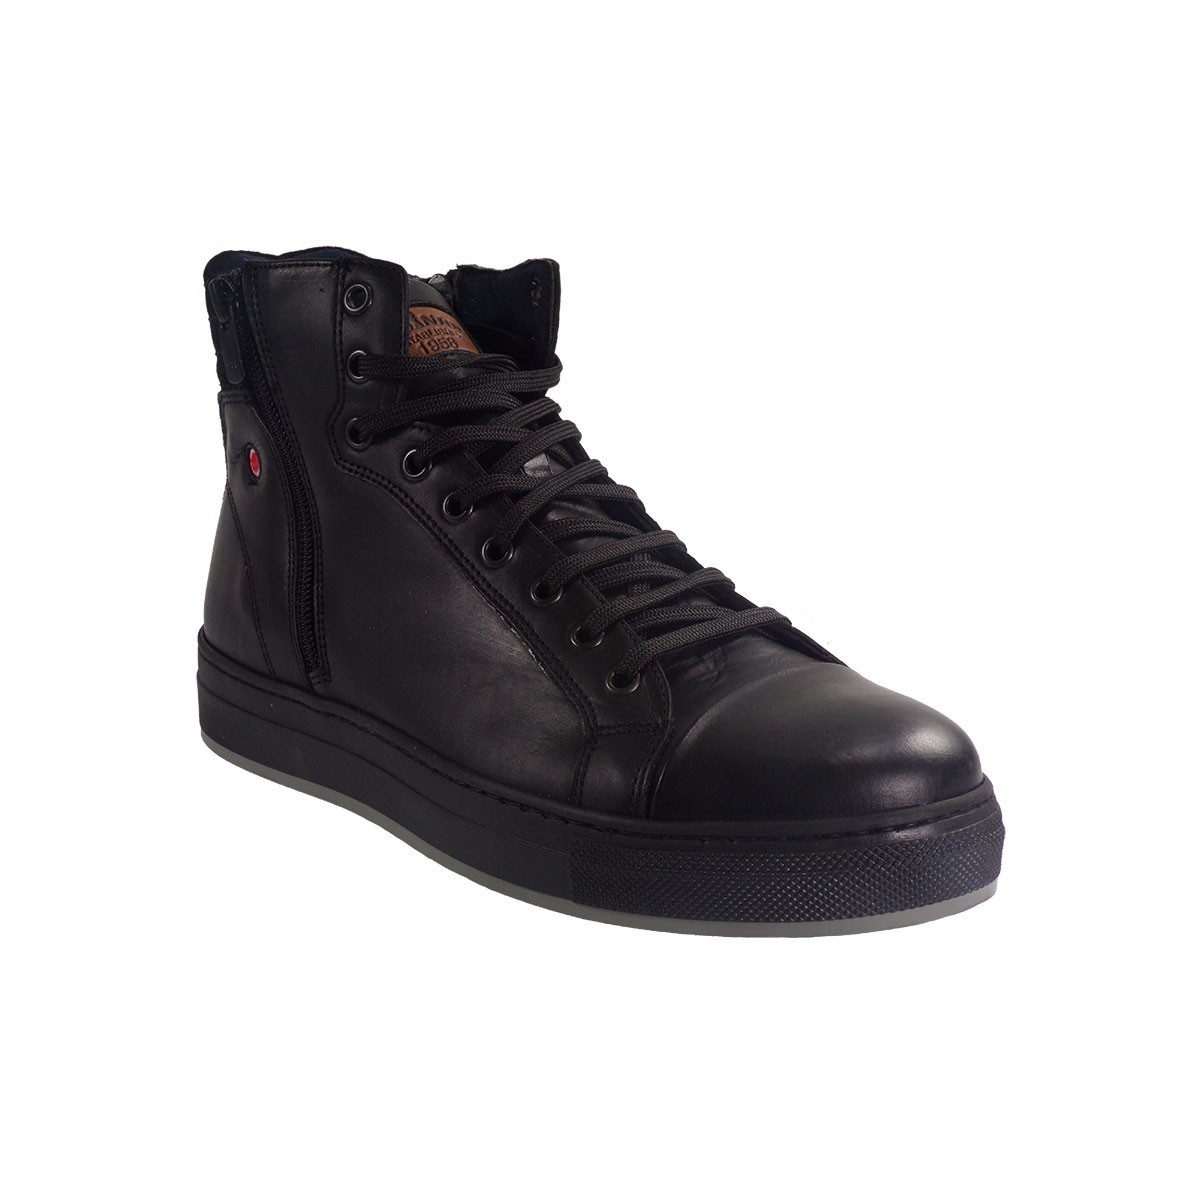 Robinson Ανδρικά Παπούτσια Μποτάκια 1692 Μαύρο Δέρμα  f831953517c